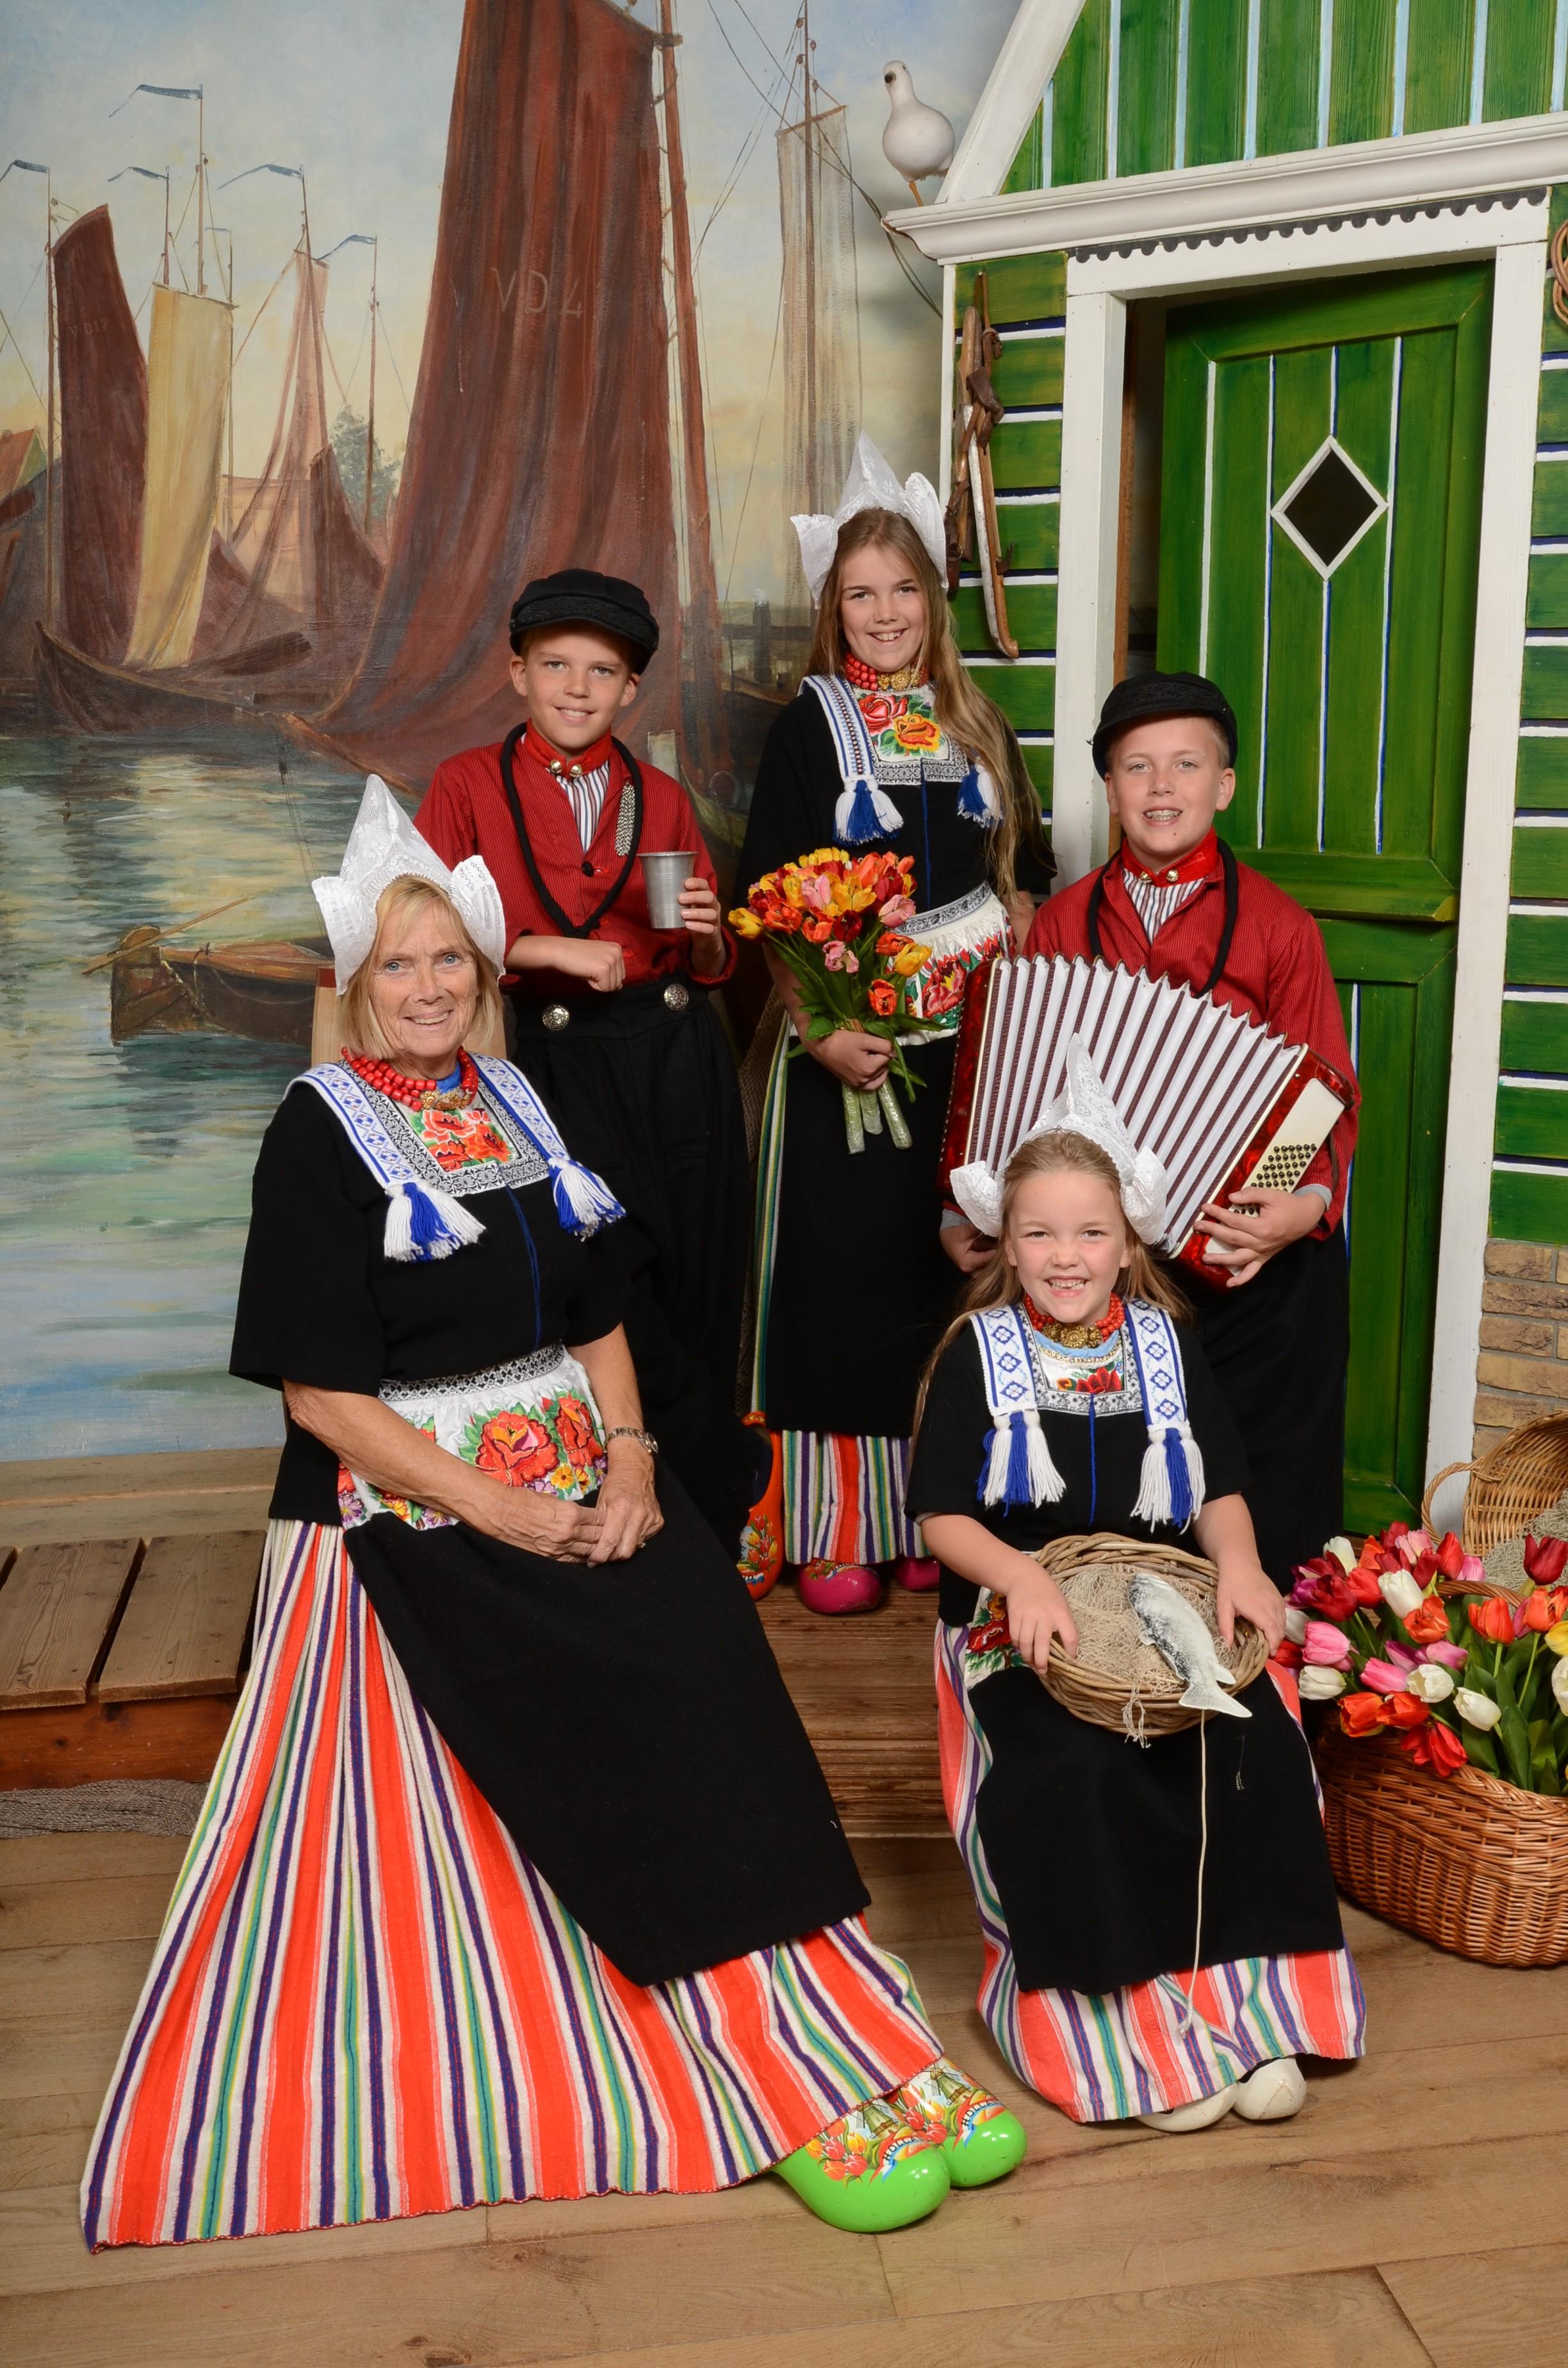 Mom and kids in Volendam costume